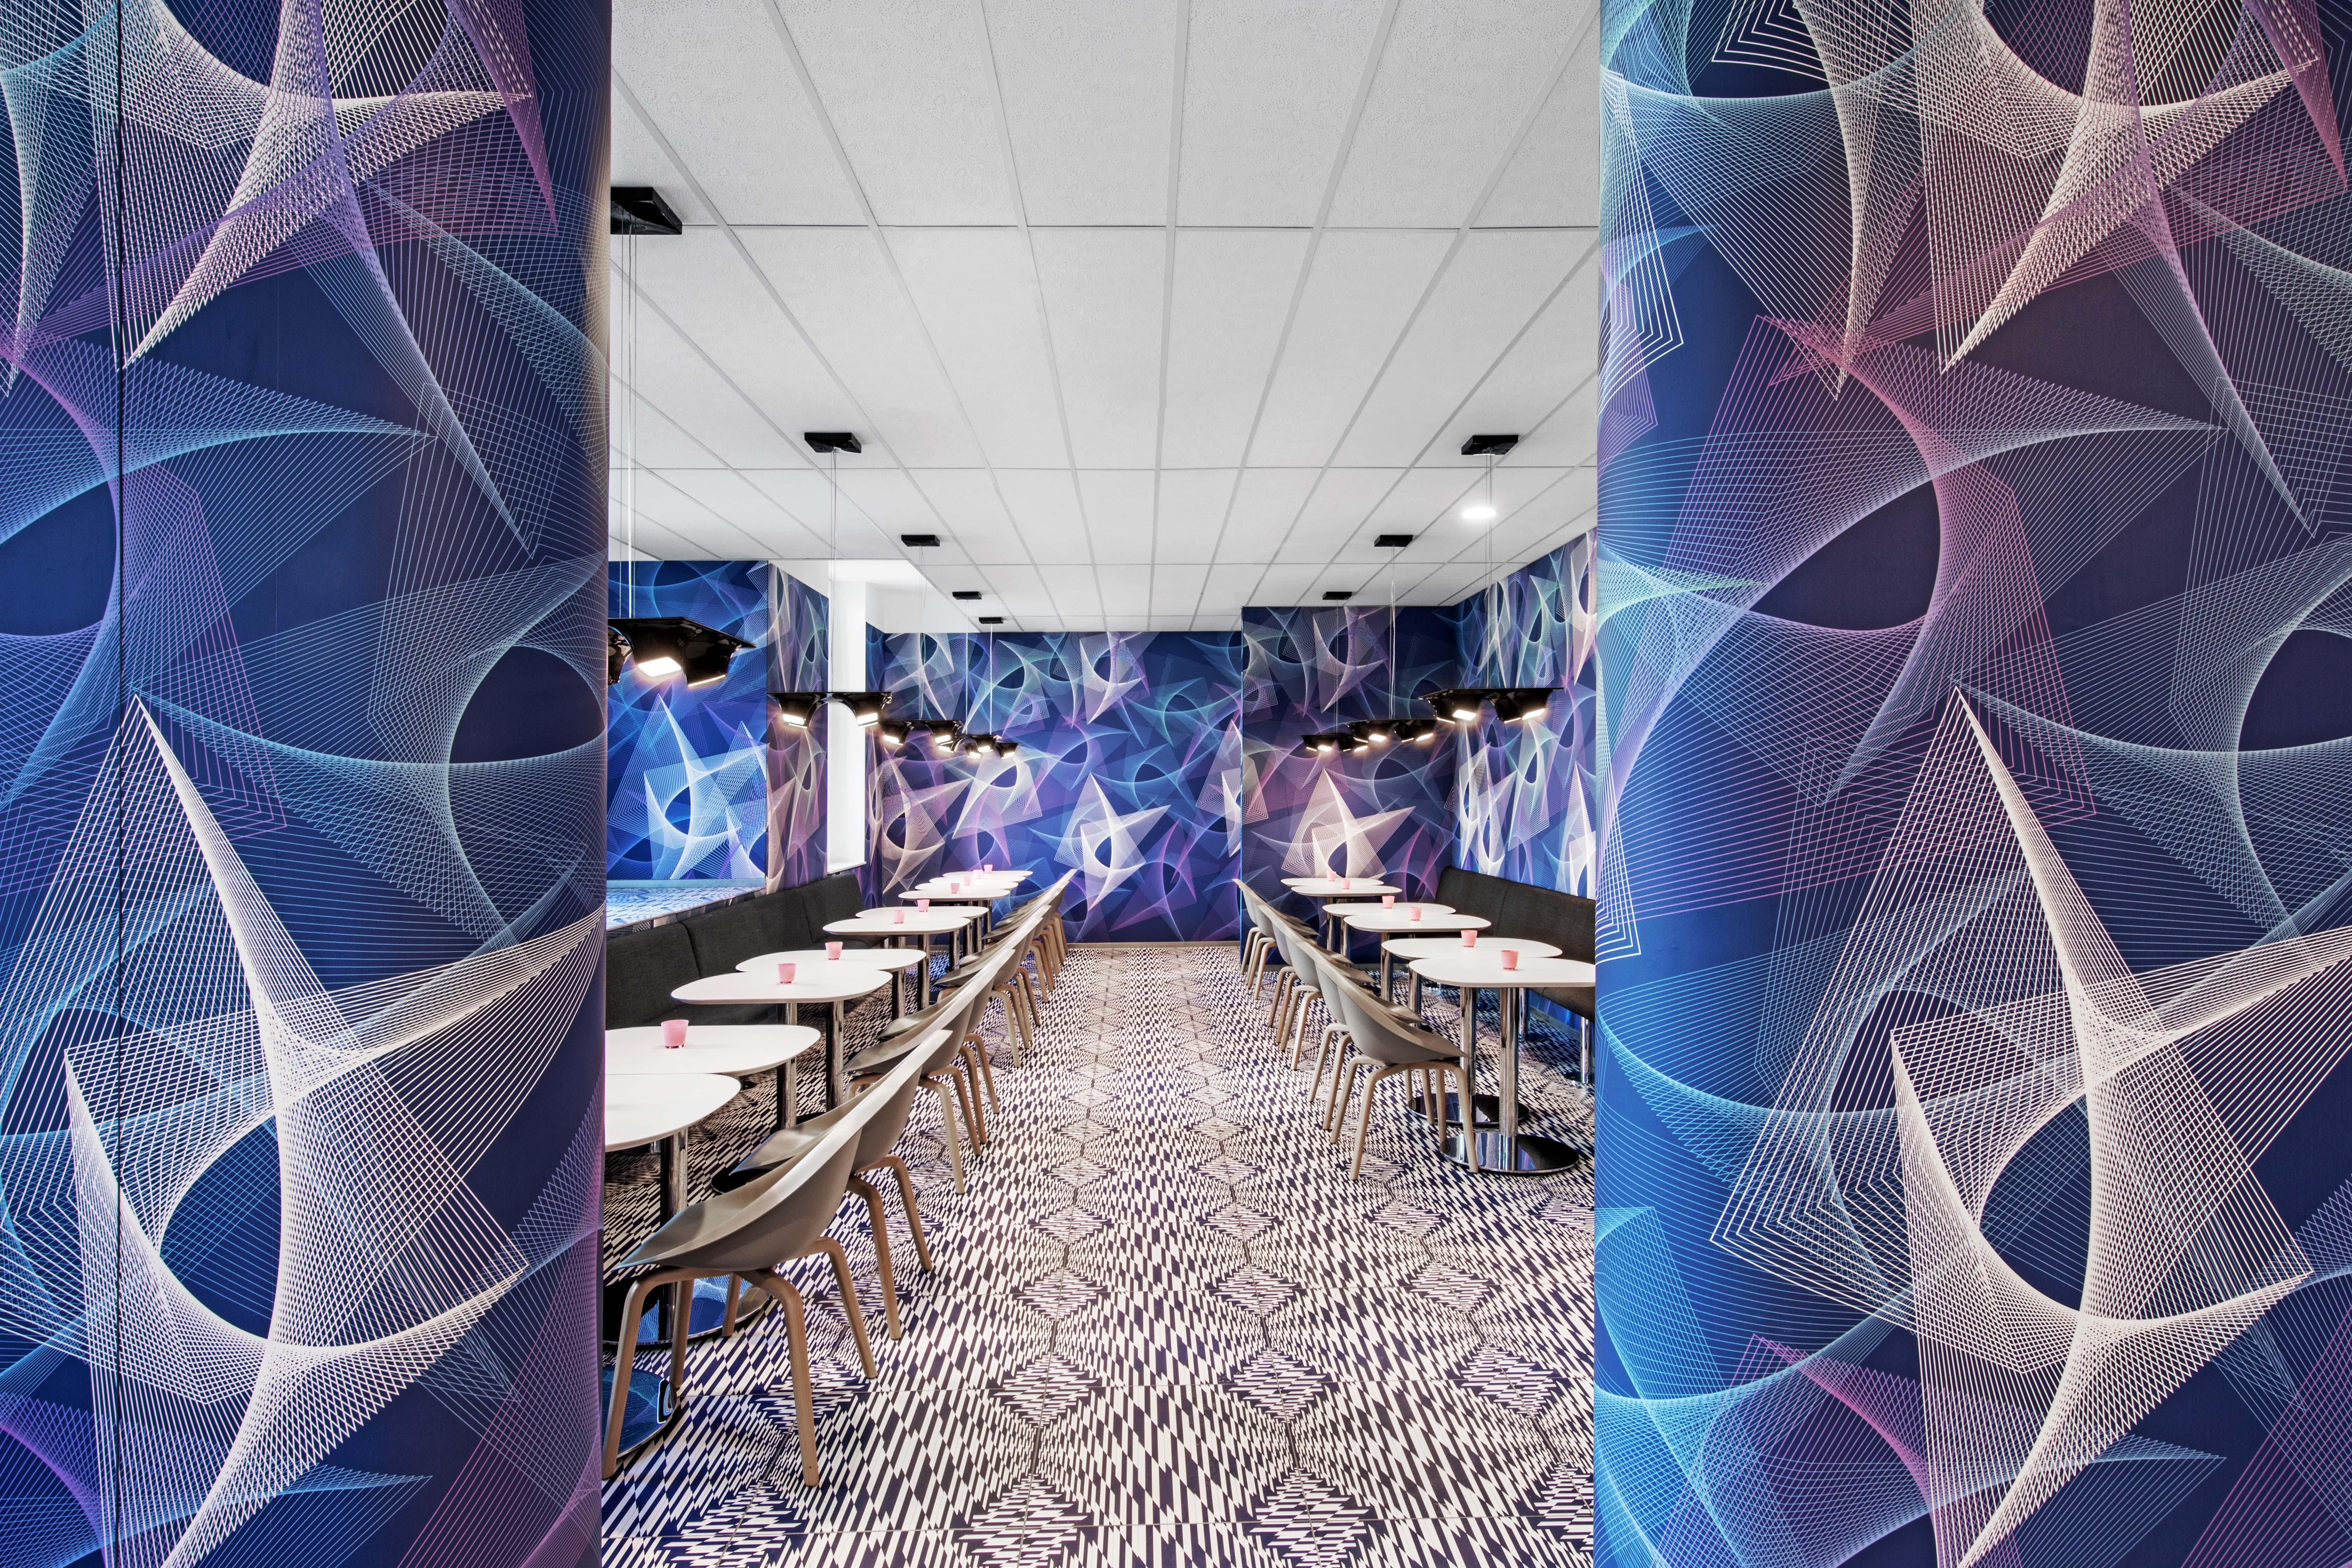 Prizeotel Das Economy Design Hotel Blog